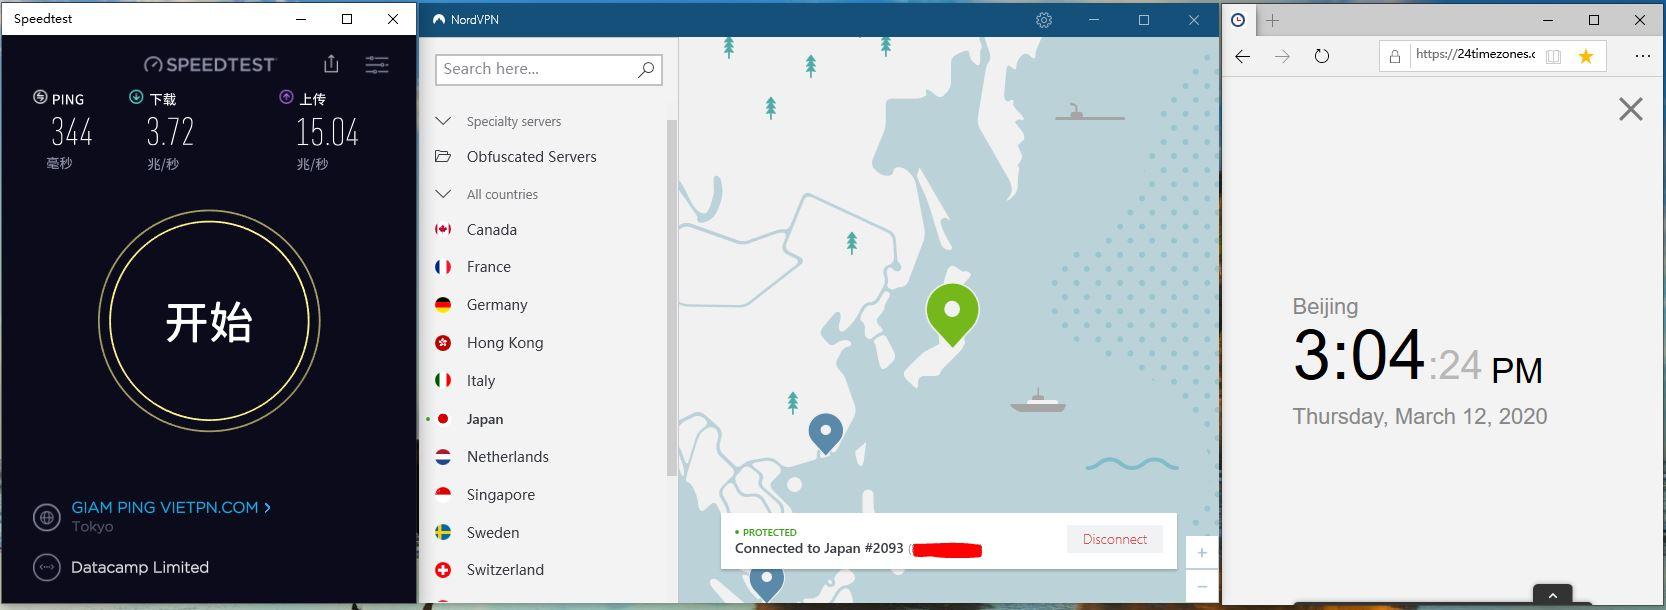 Windows10 NordVPN Japan #2093 中国VPN翻墙 科学上网 SpeedTest测速 - 20200312